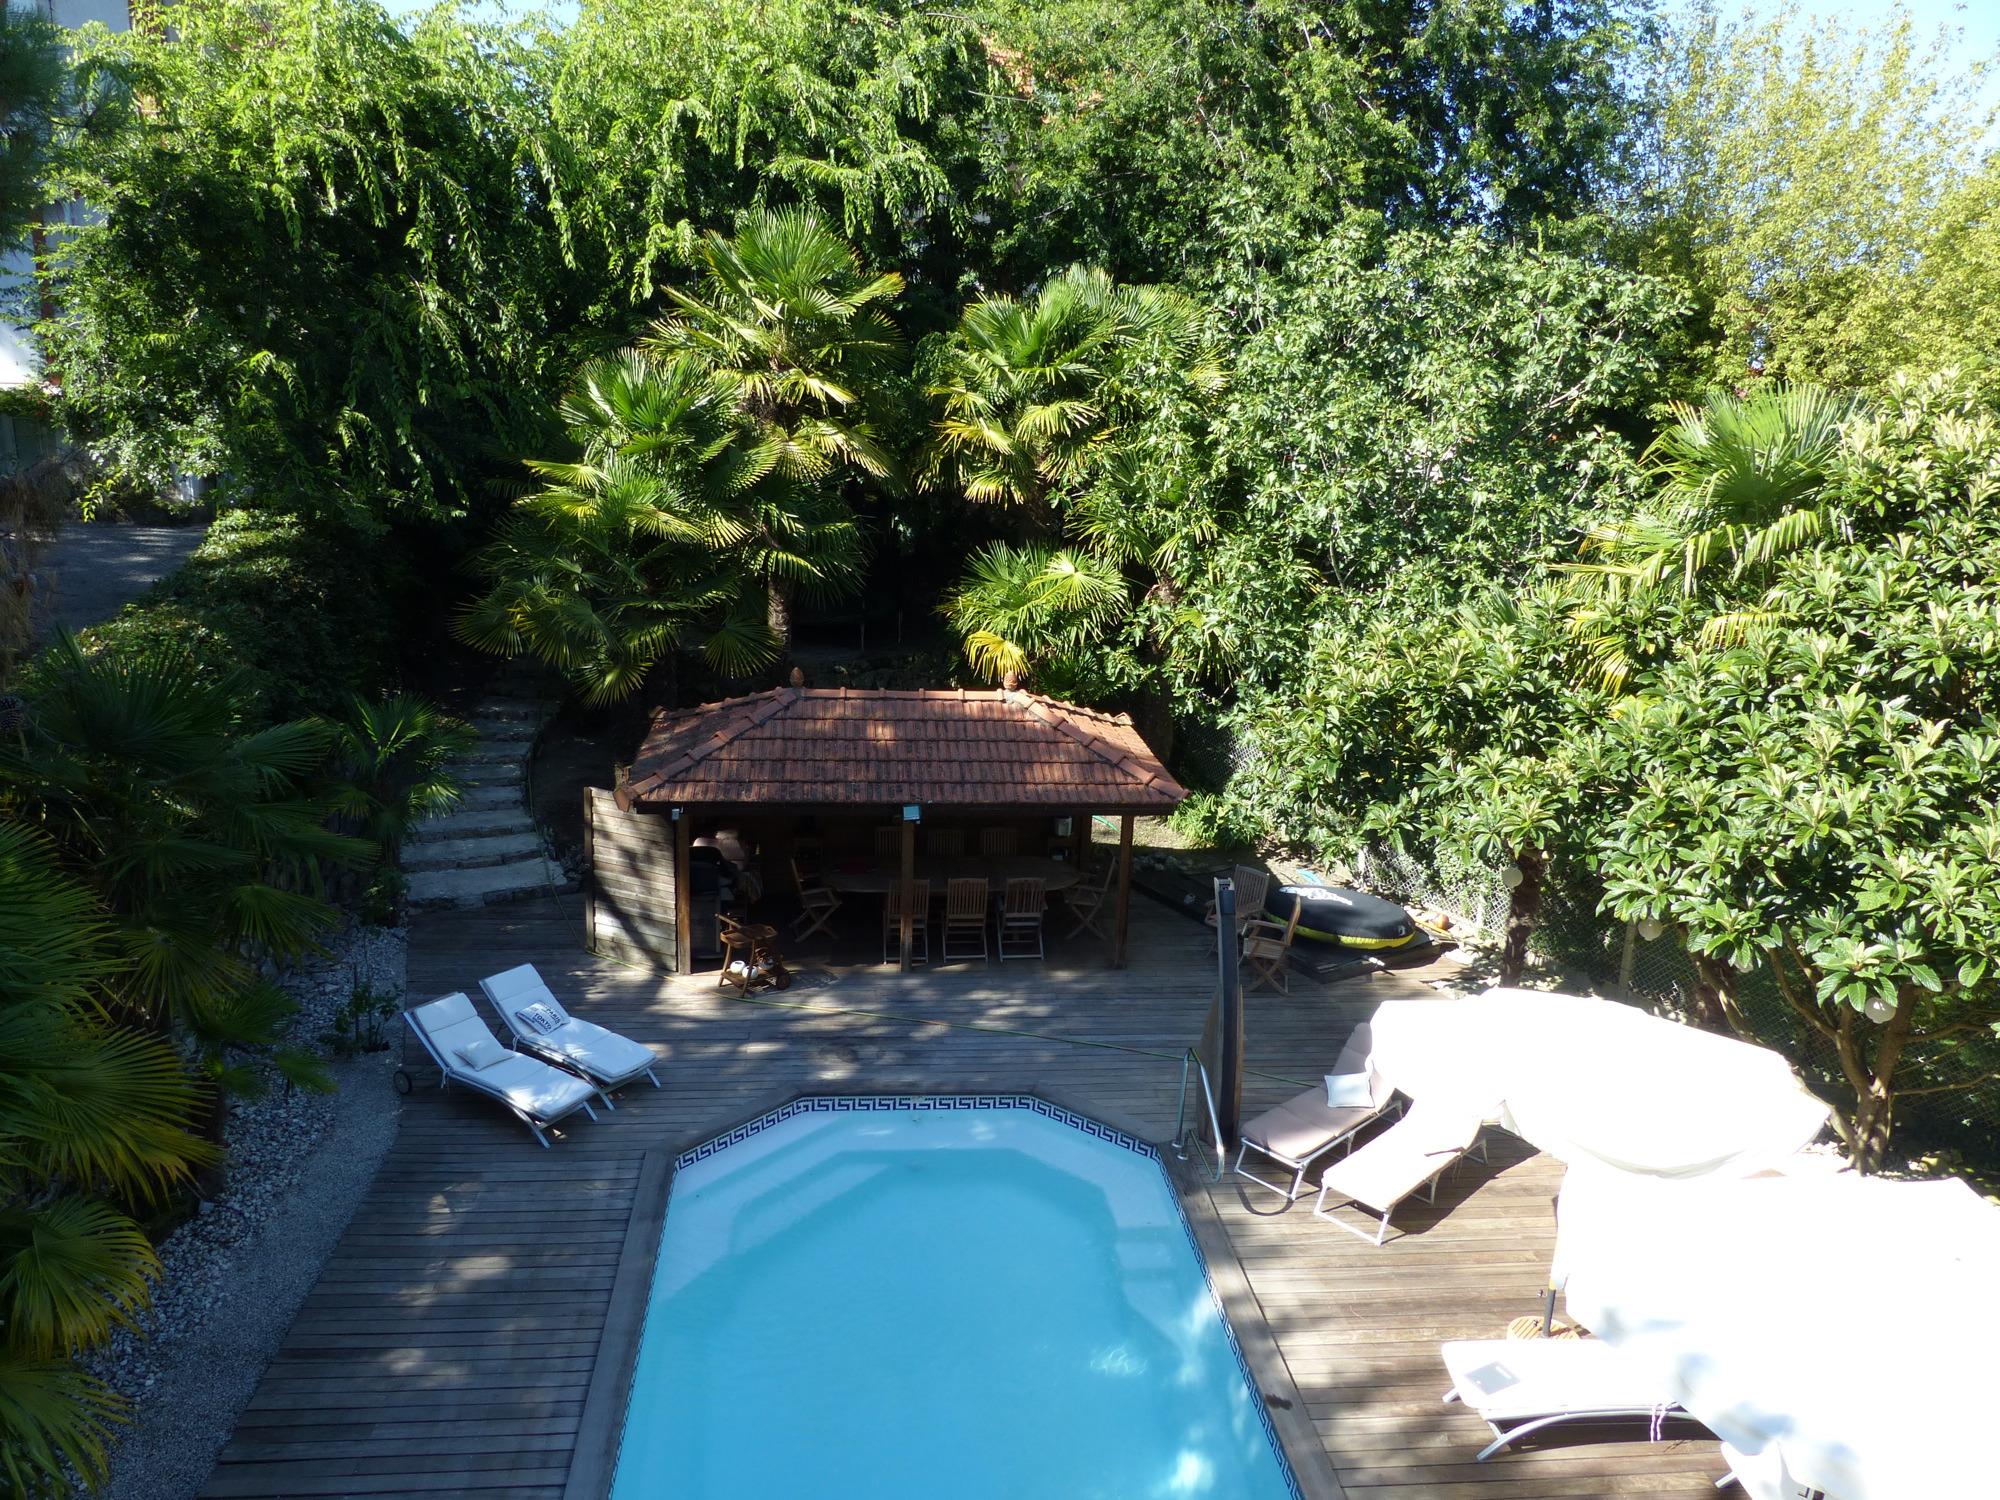 Vente arcachon belle demeure avec piscine barnes bassin - Location maison piscine arcachon ...